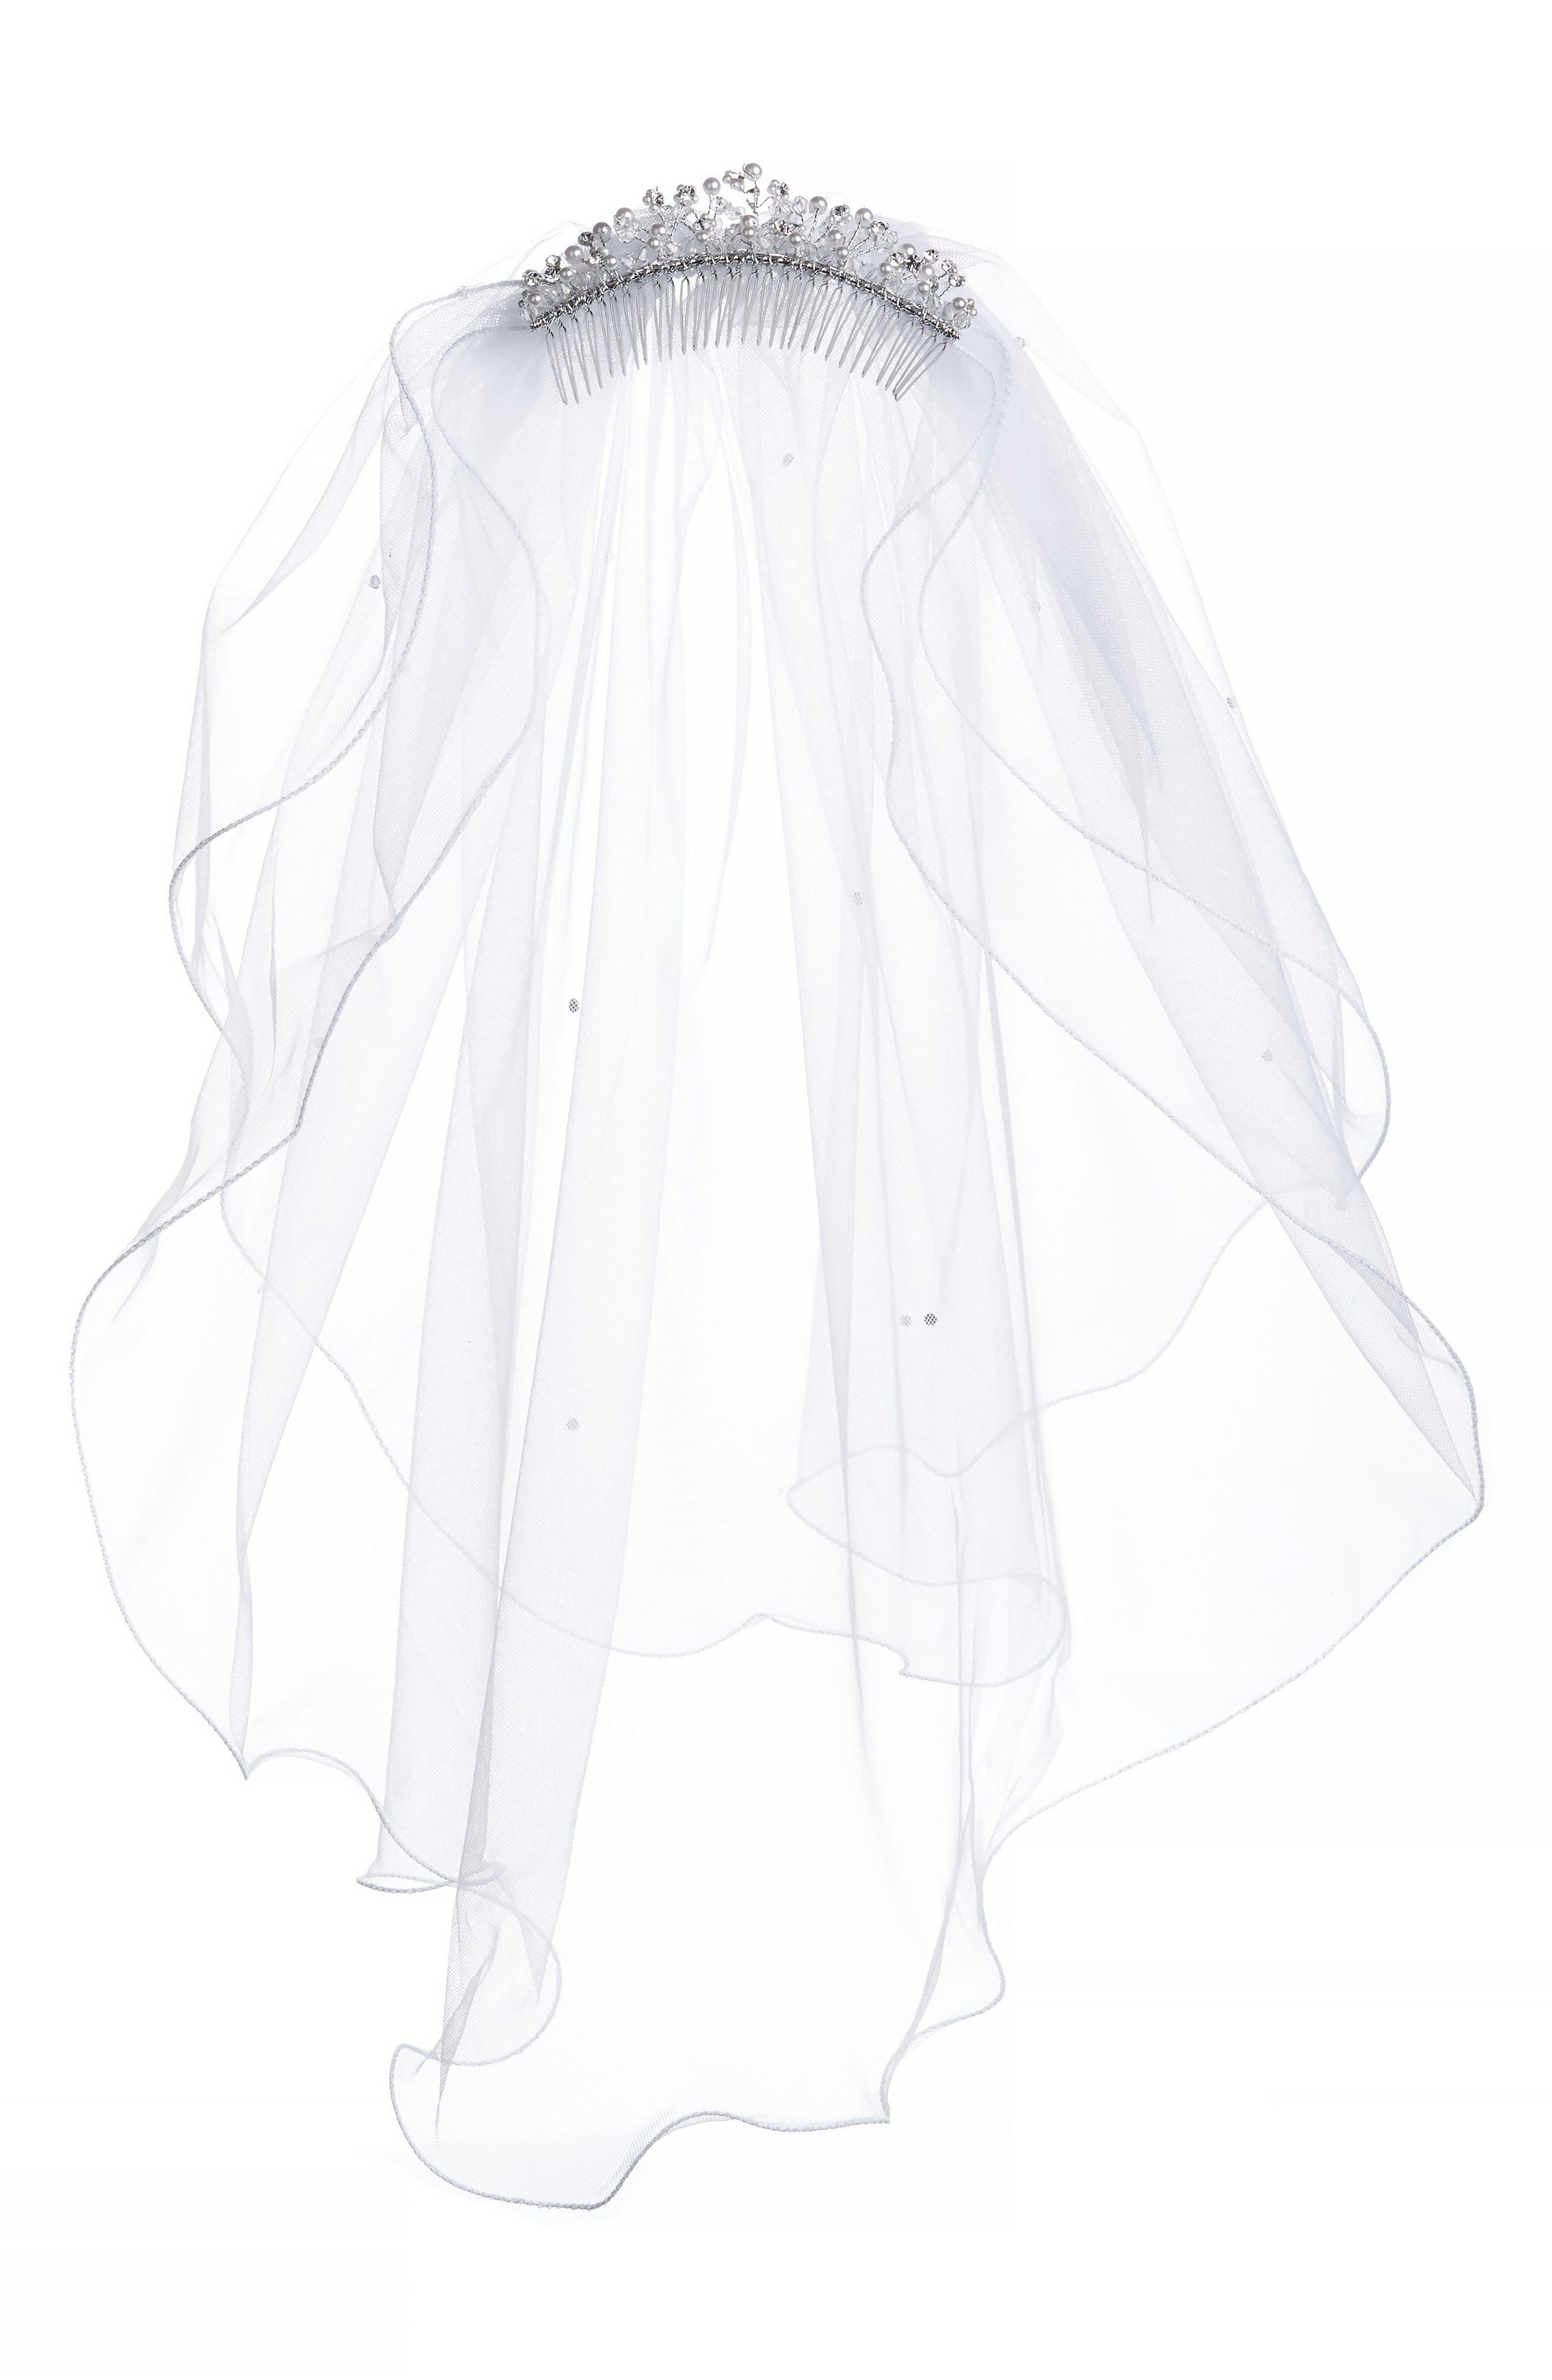 Imitation Pearl Crown & Veil,                             Main thumbnail 1, color,                             WHITE